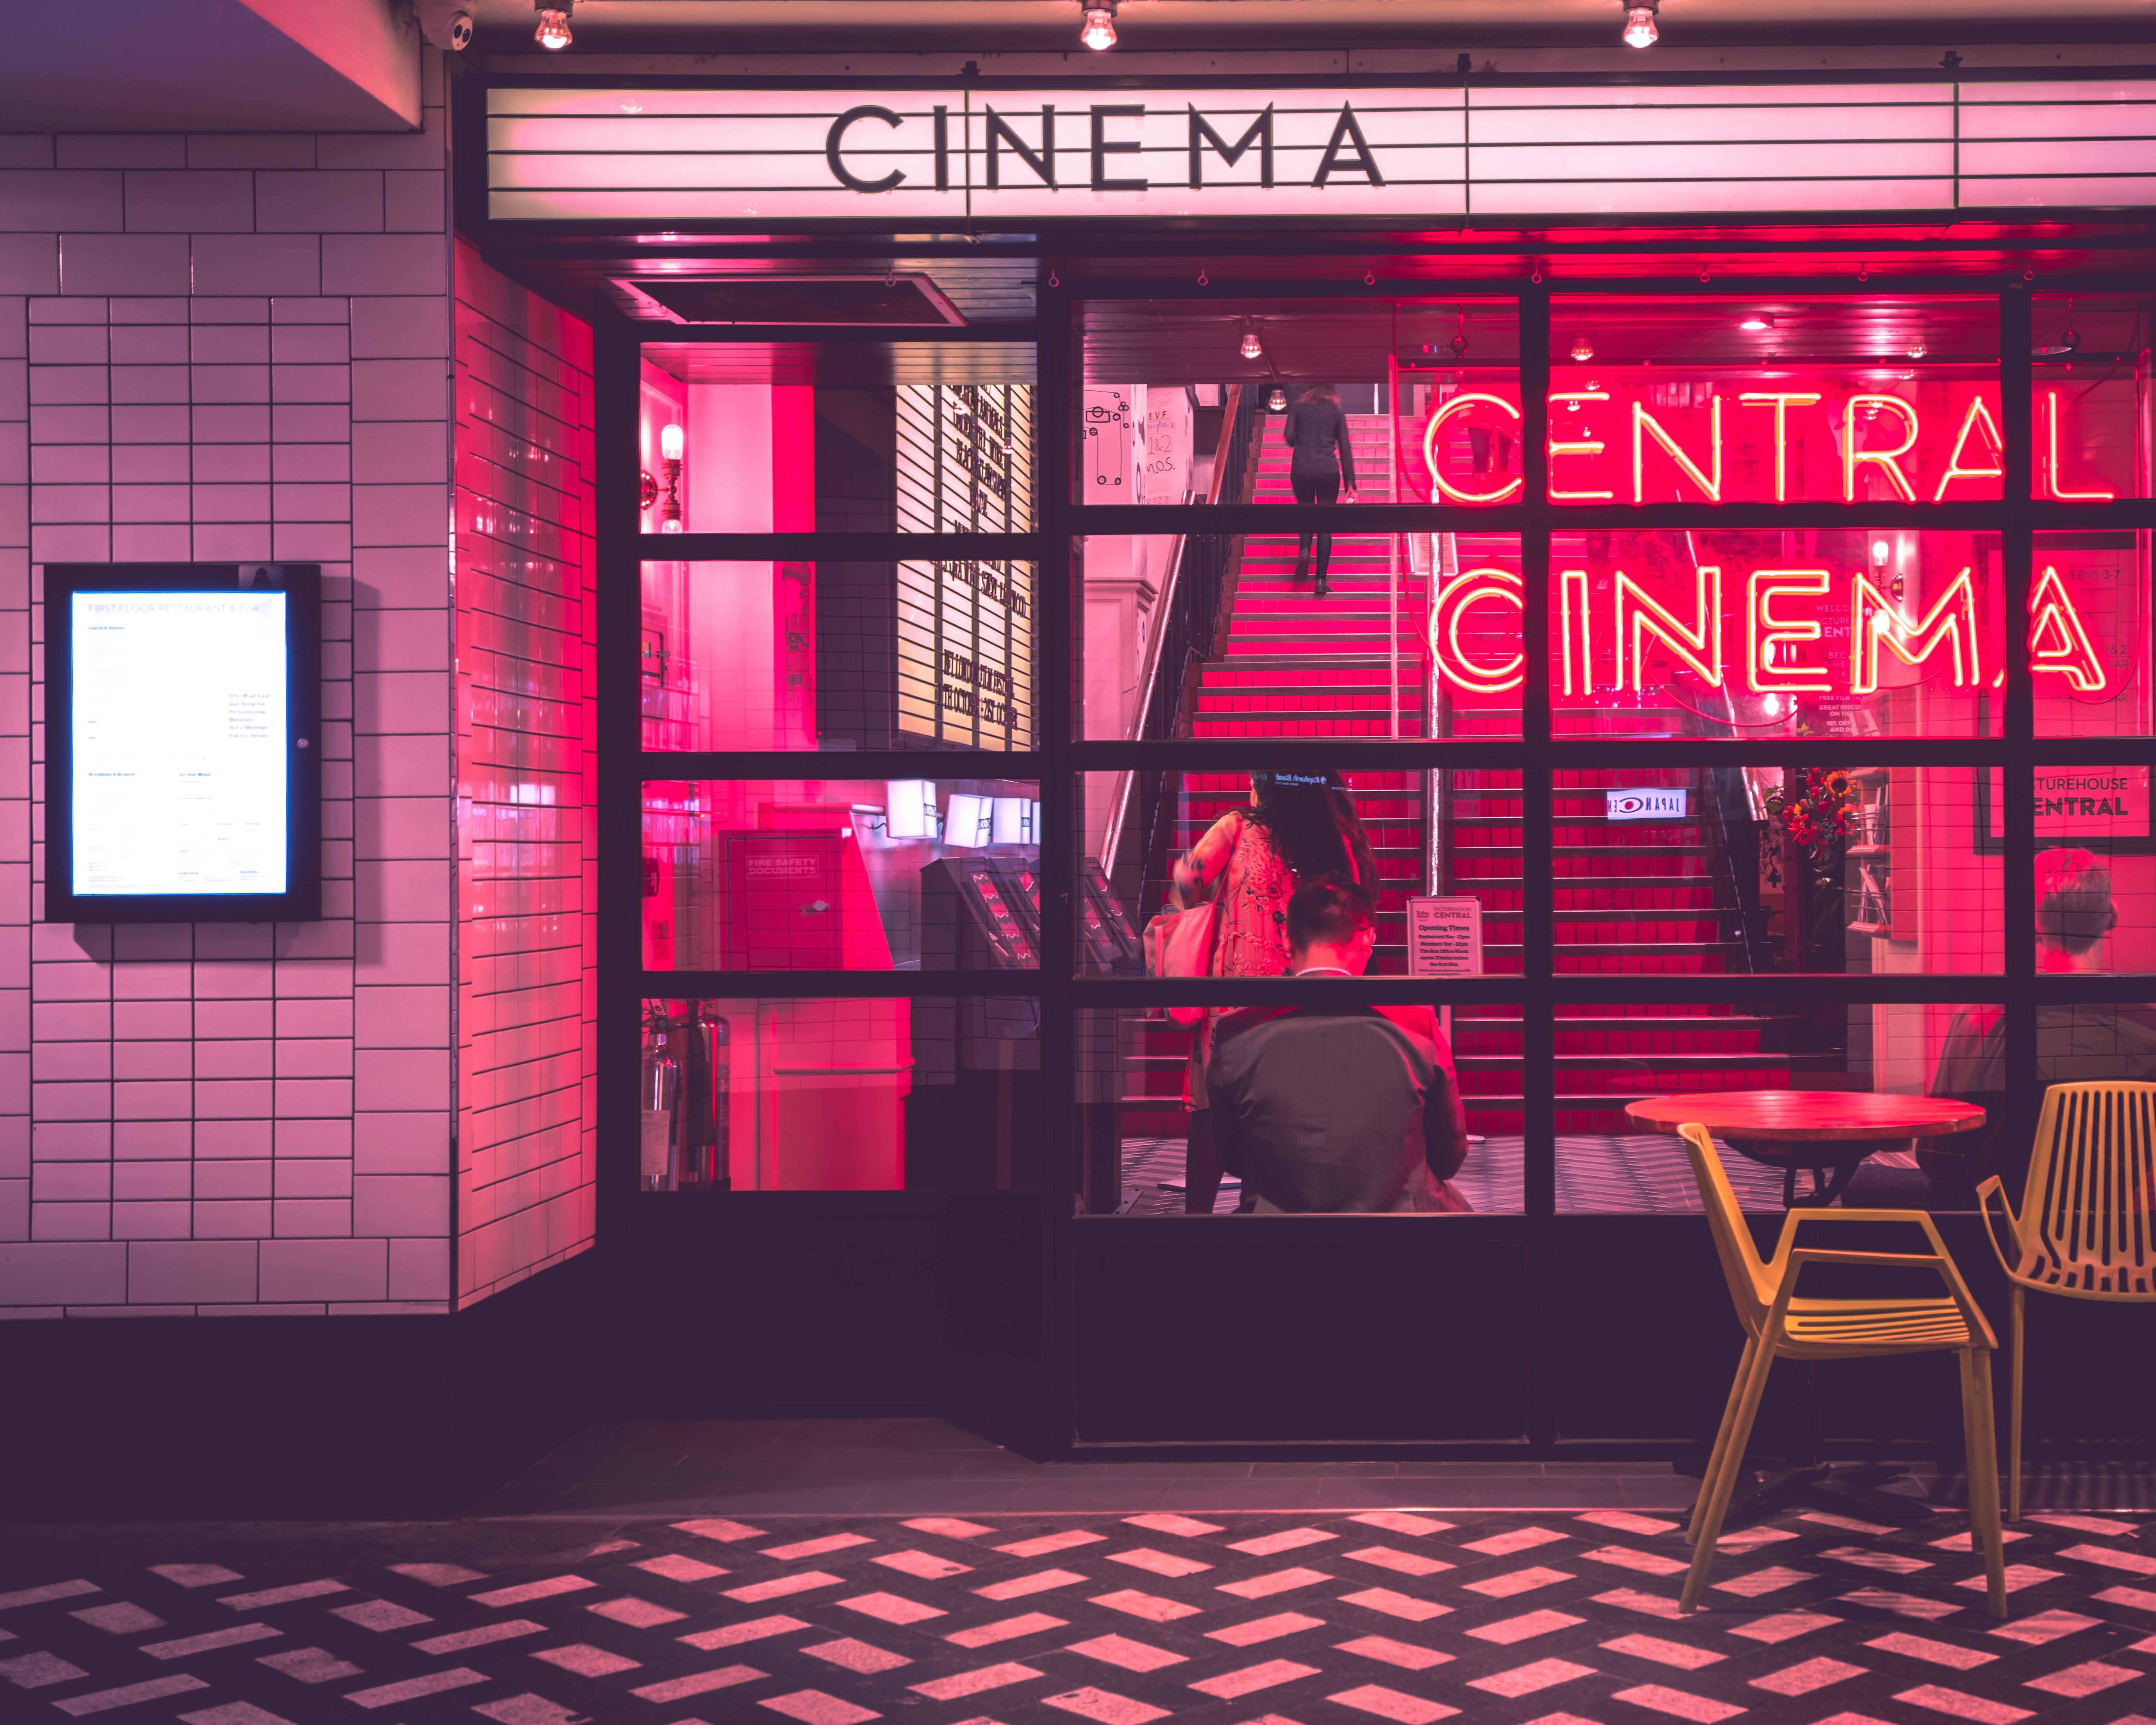 A cinema storefront. Photo by Myke Simon via Unsplash.